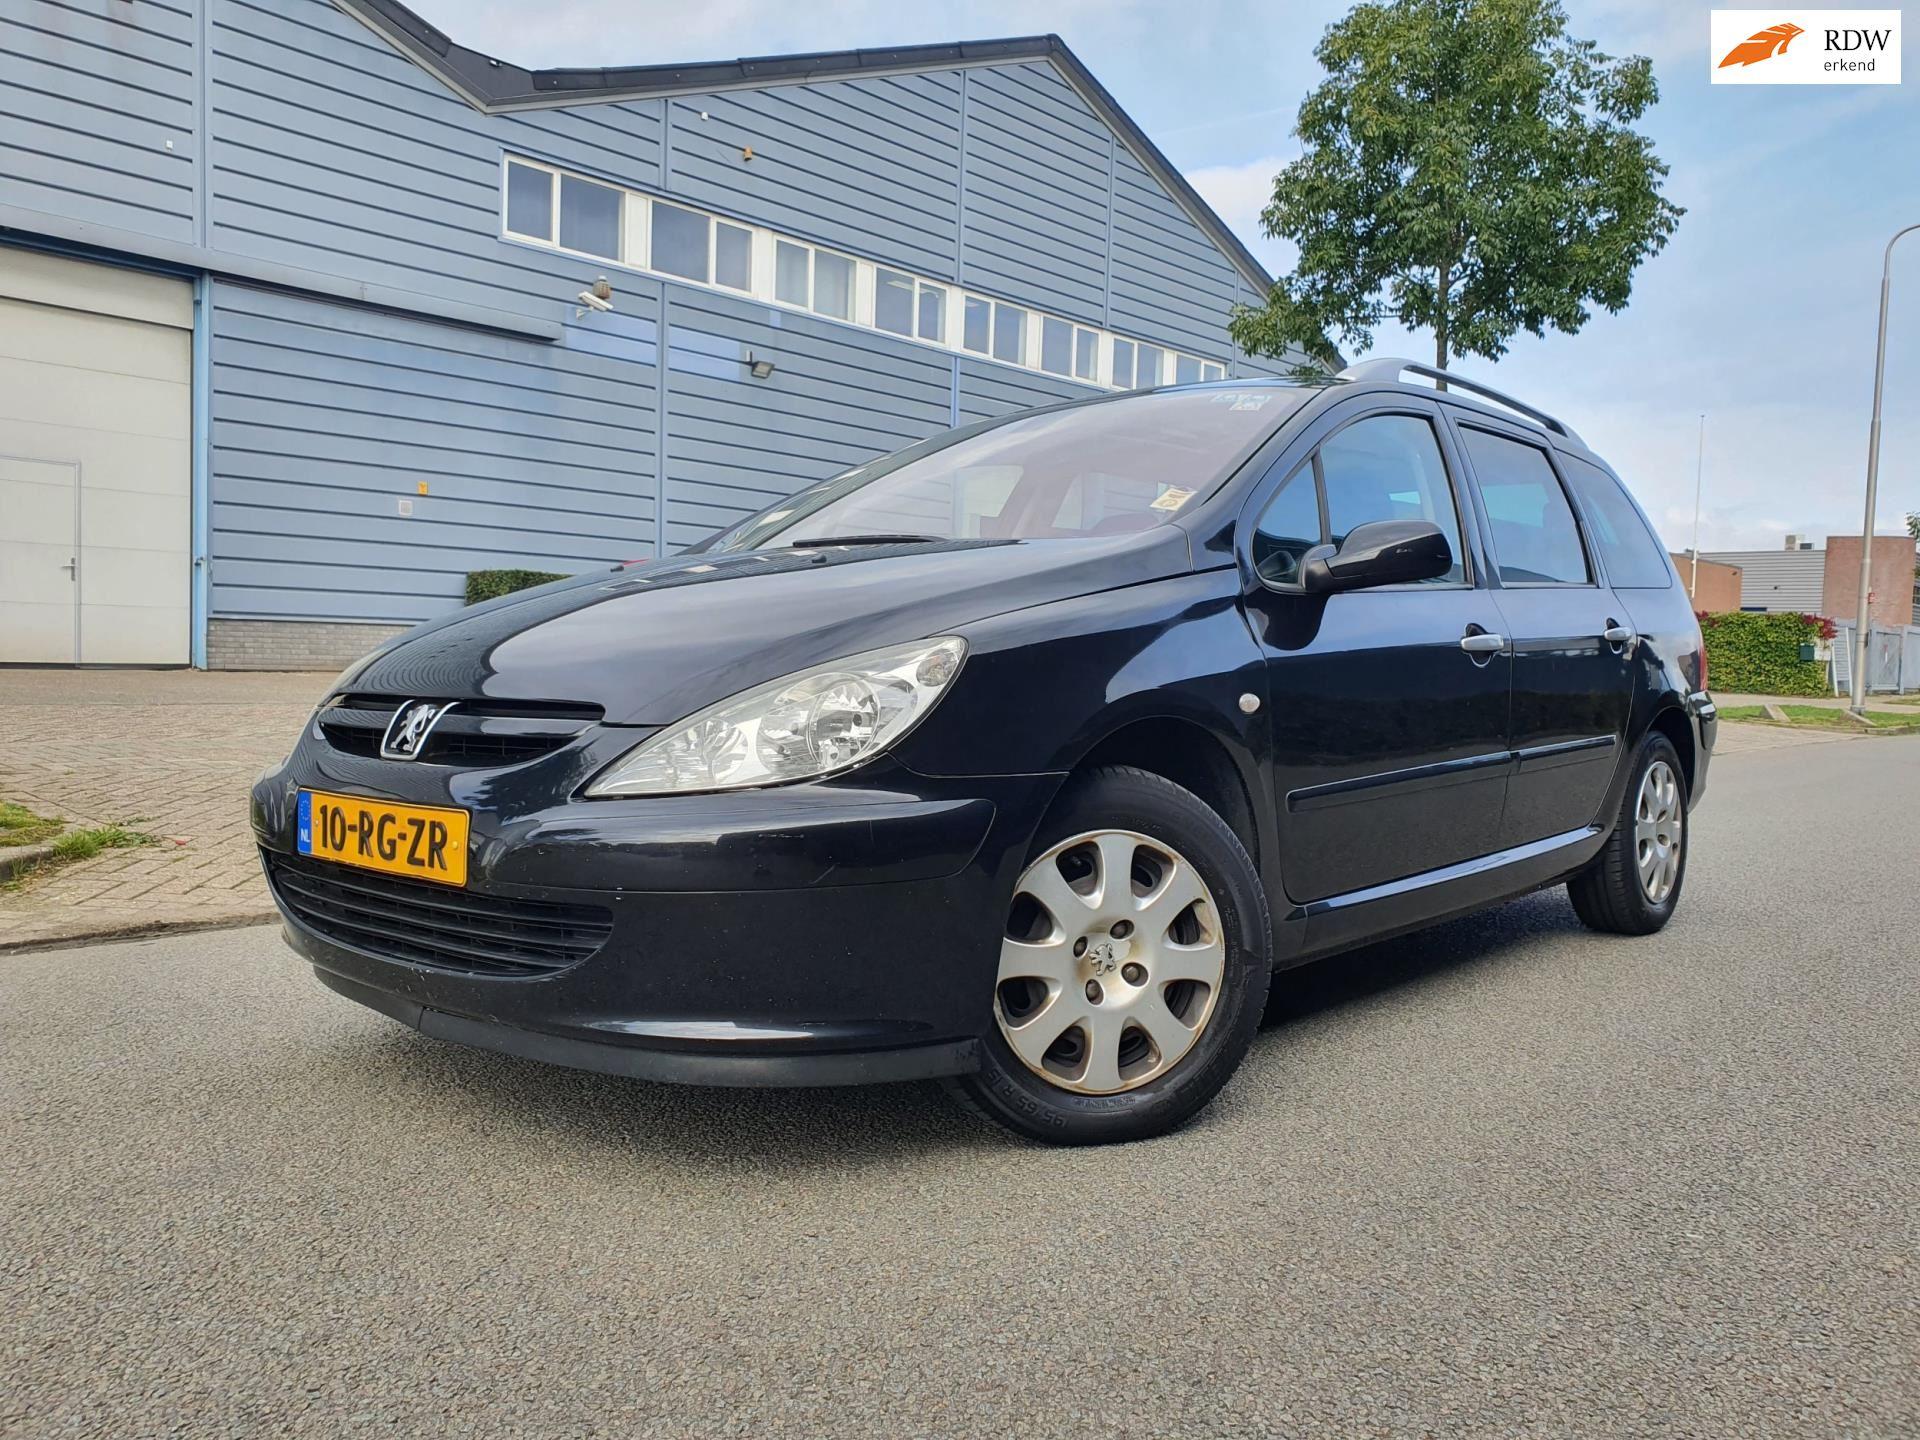 Peugeot 307 SW occasion - Autohandel Direct